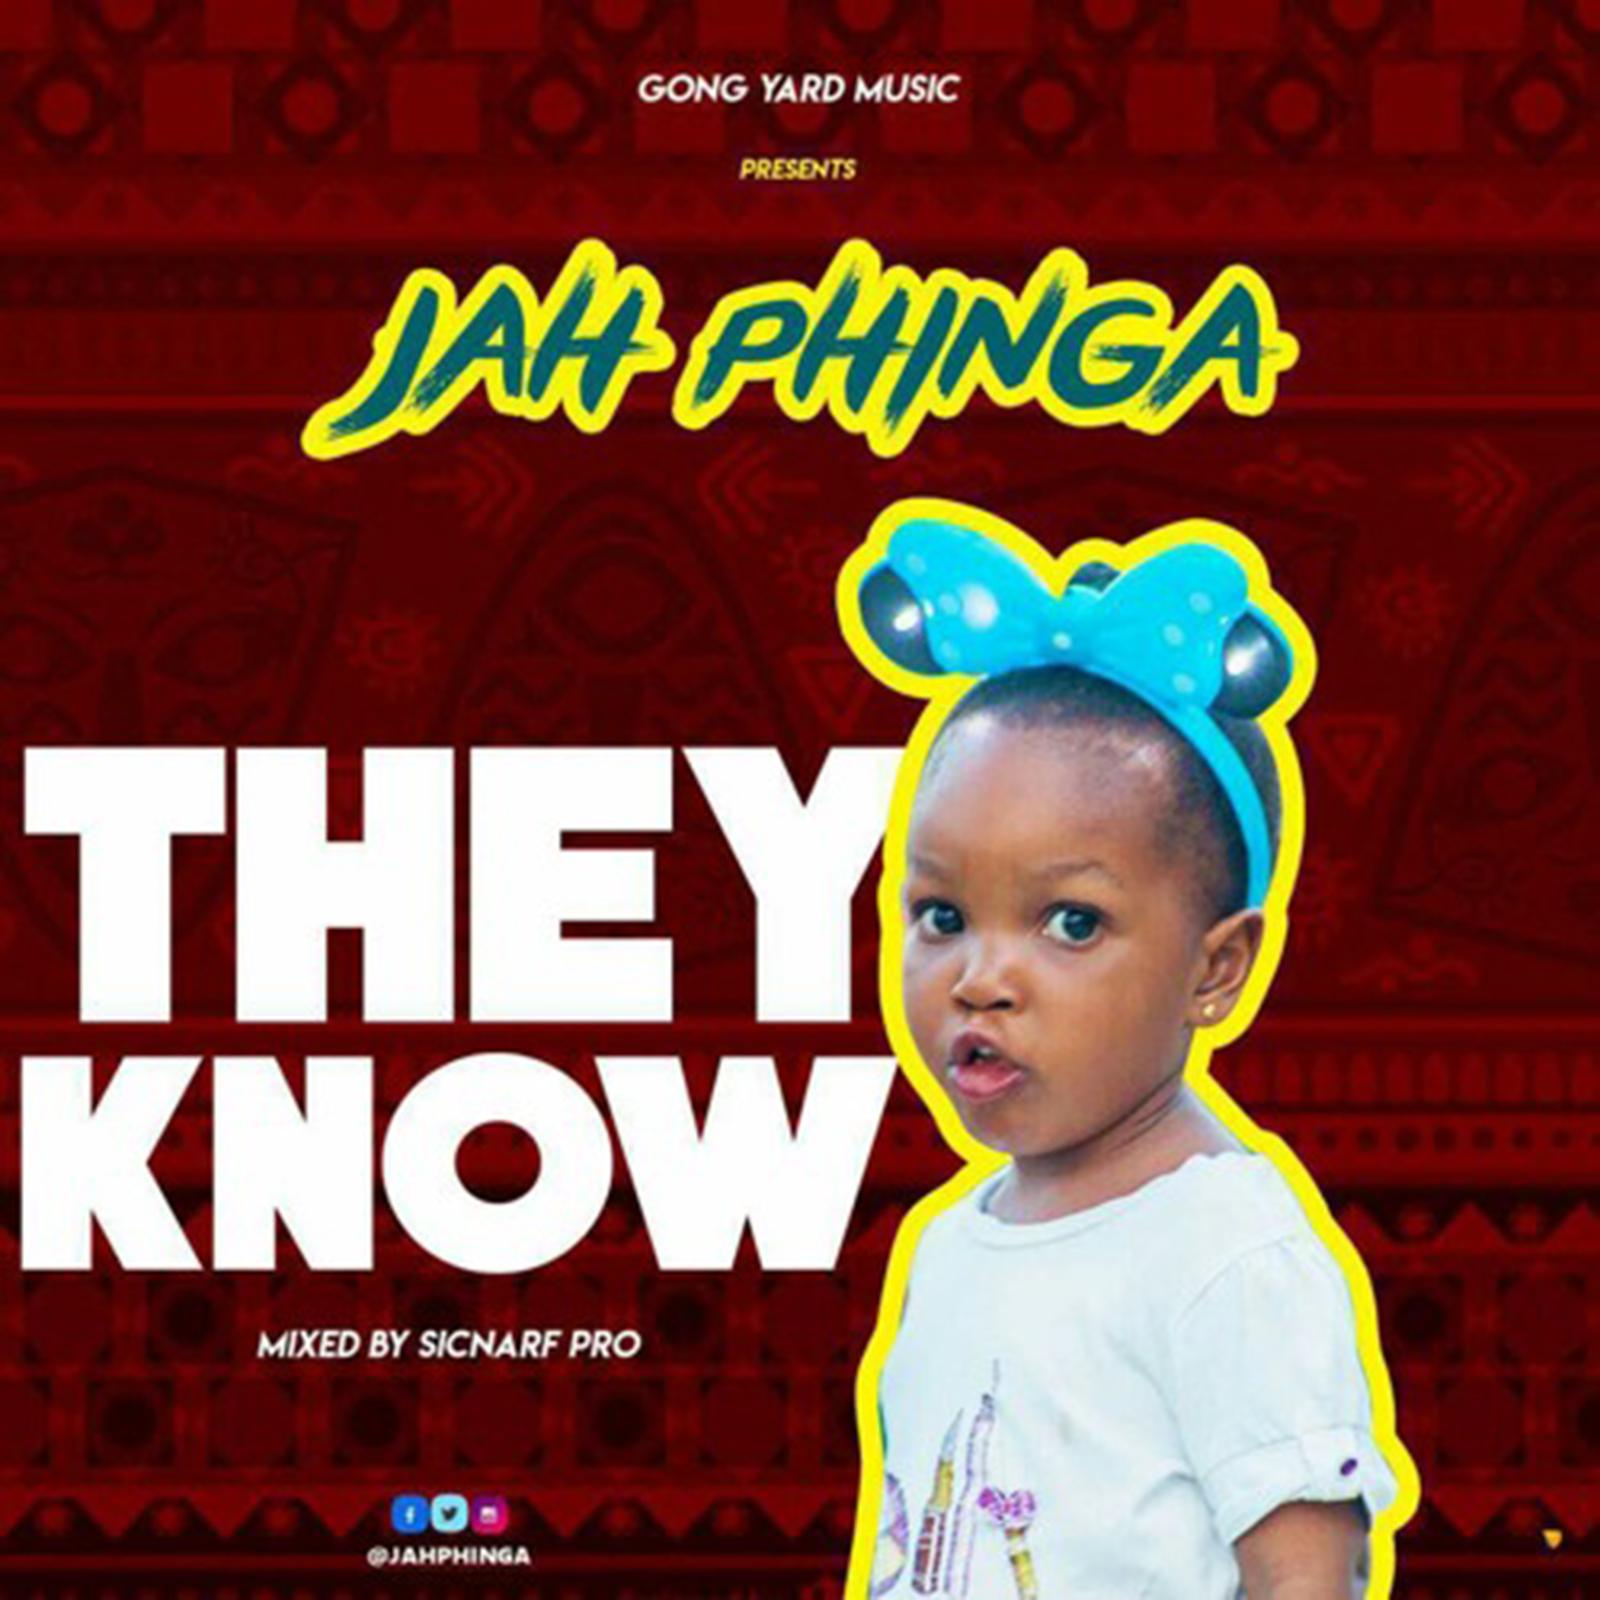 They Know by Jah Phinga